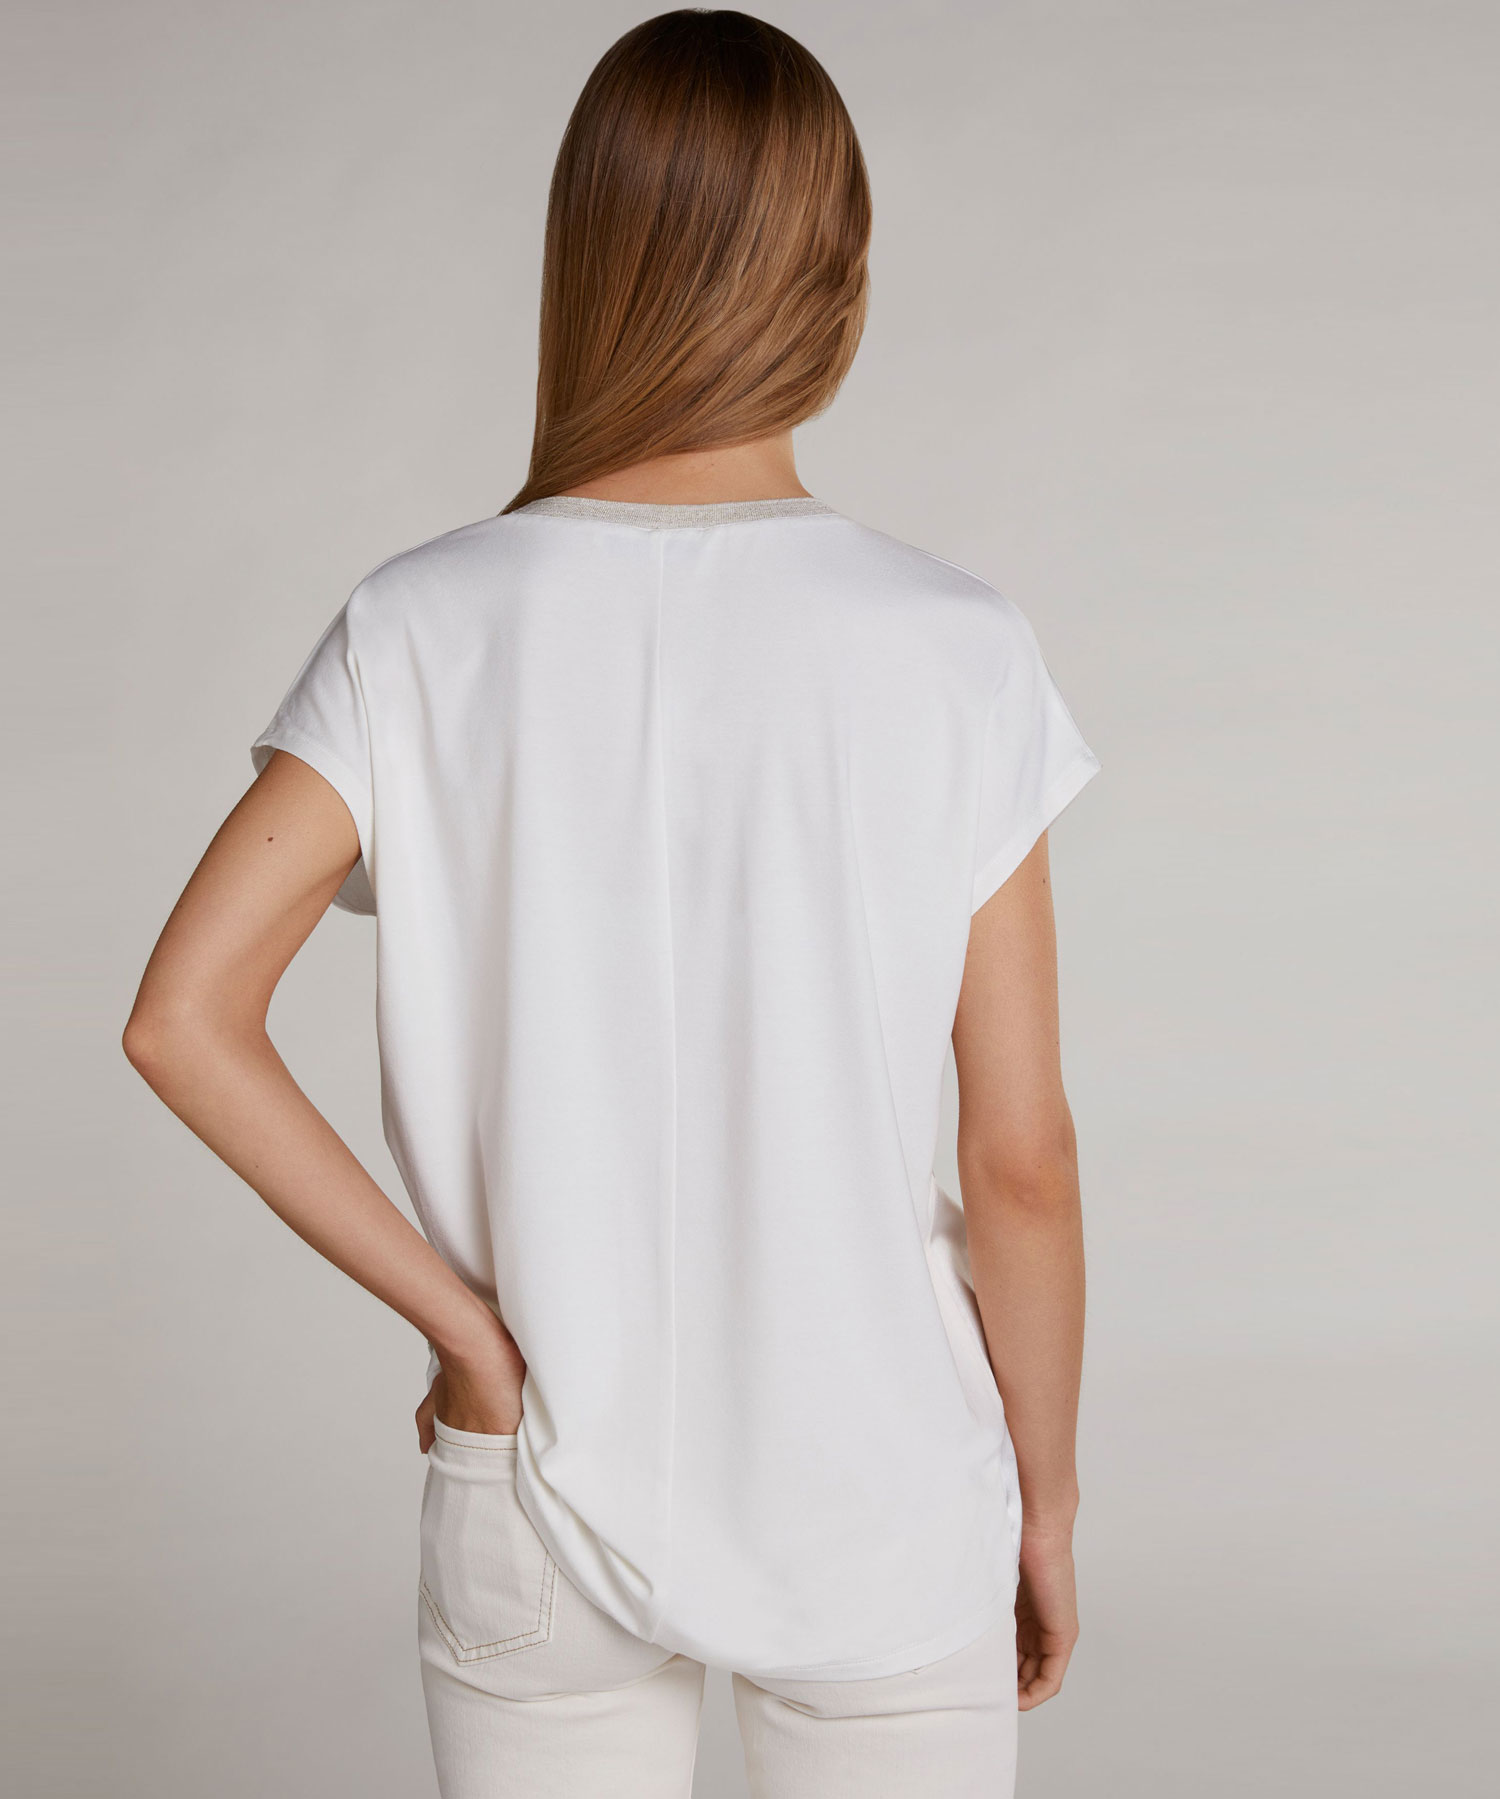 Oui shirt zijdelook